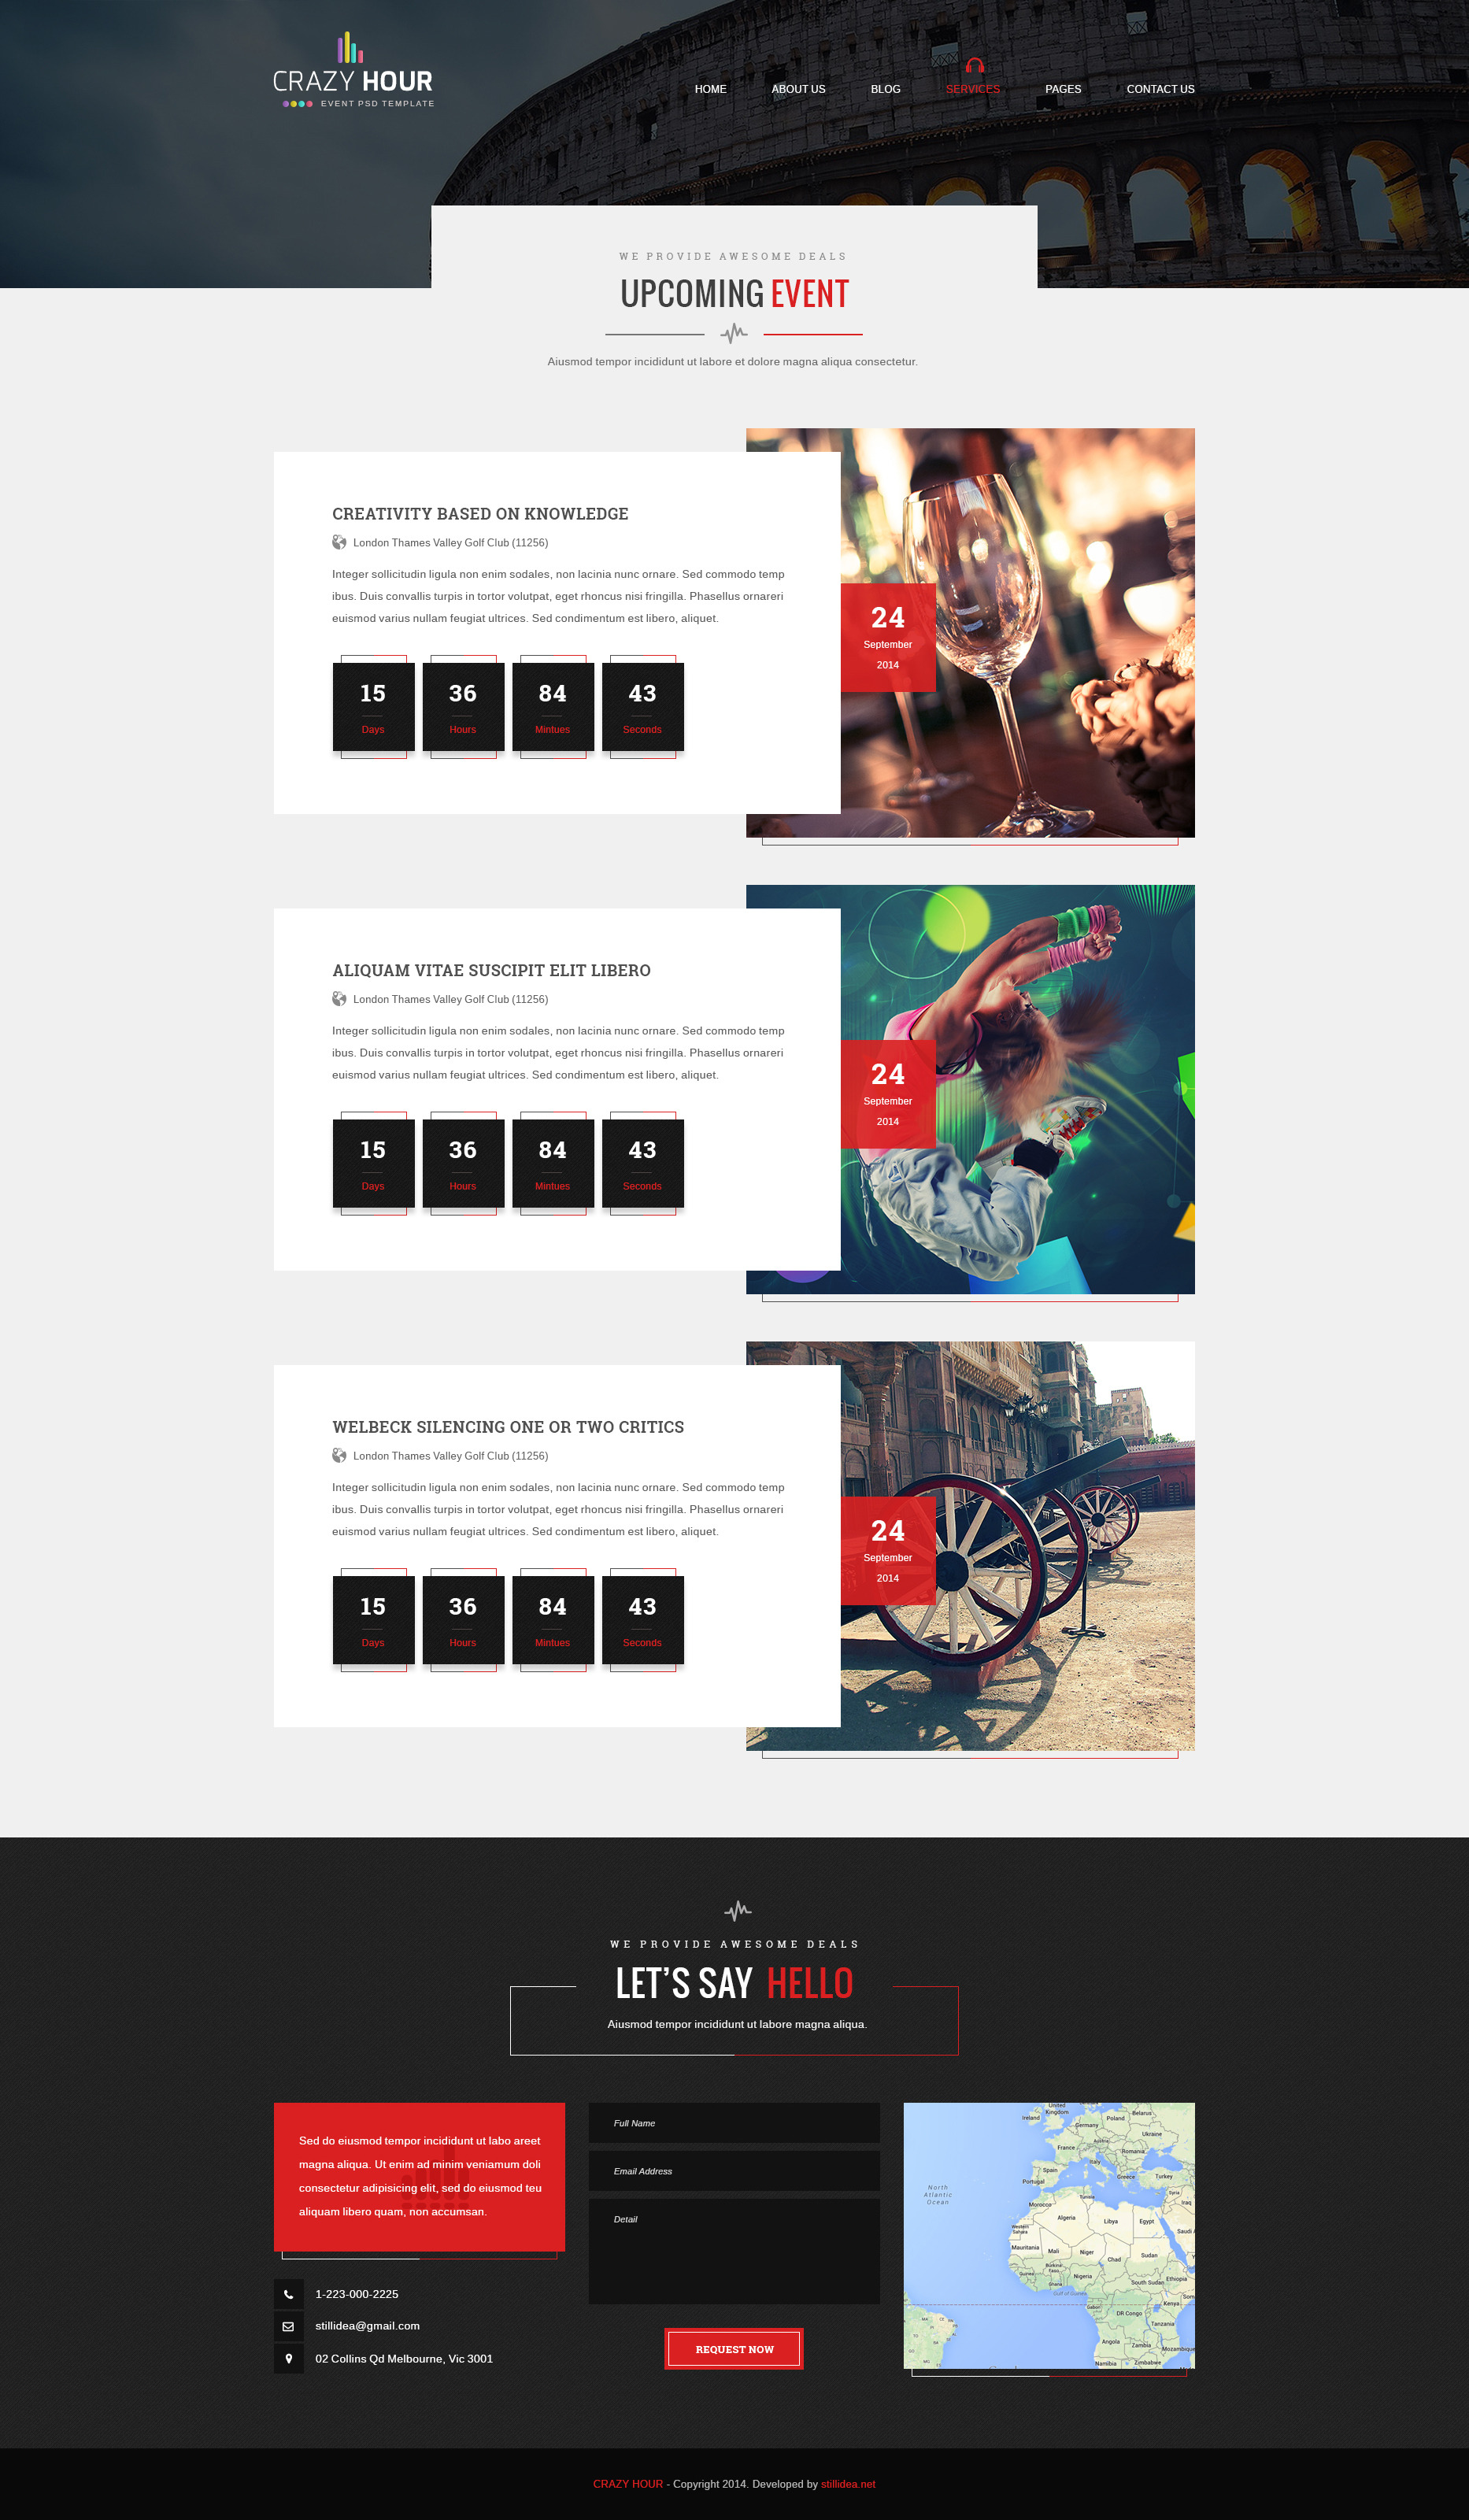 Crazy Hour - Event Management PSD Template by stillidea | ThemeForest